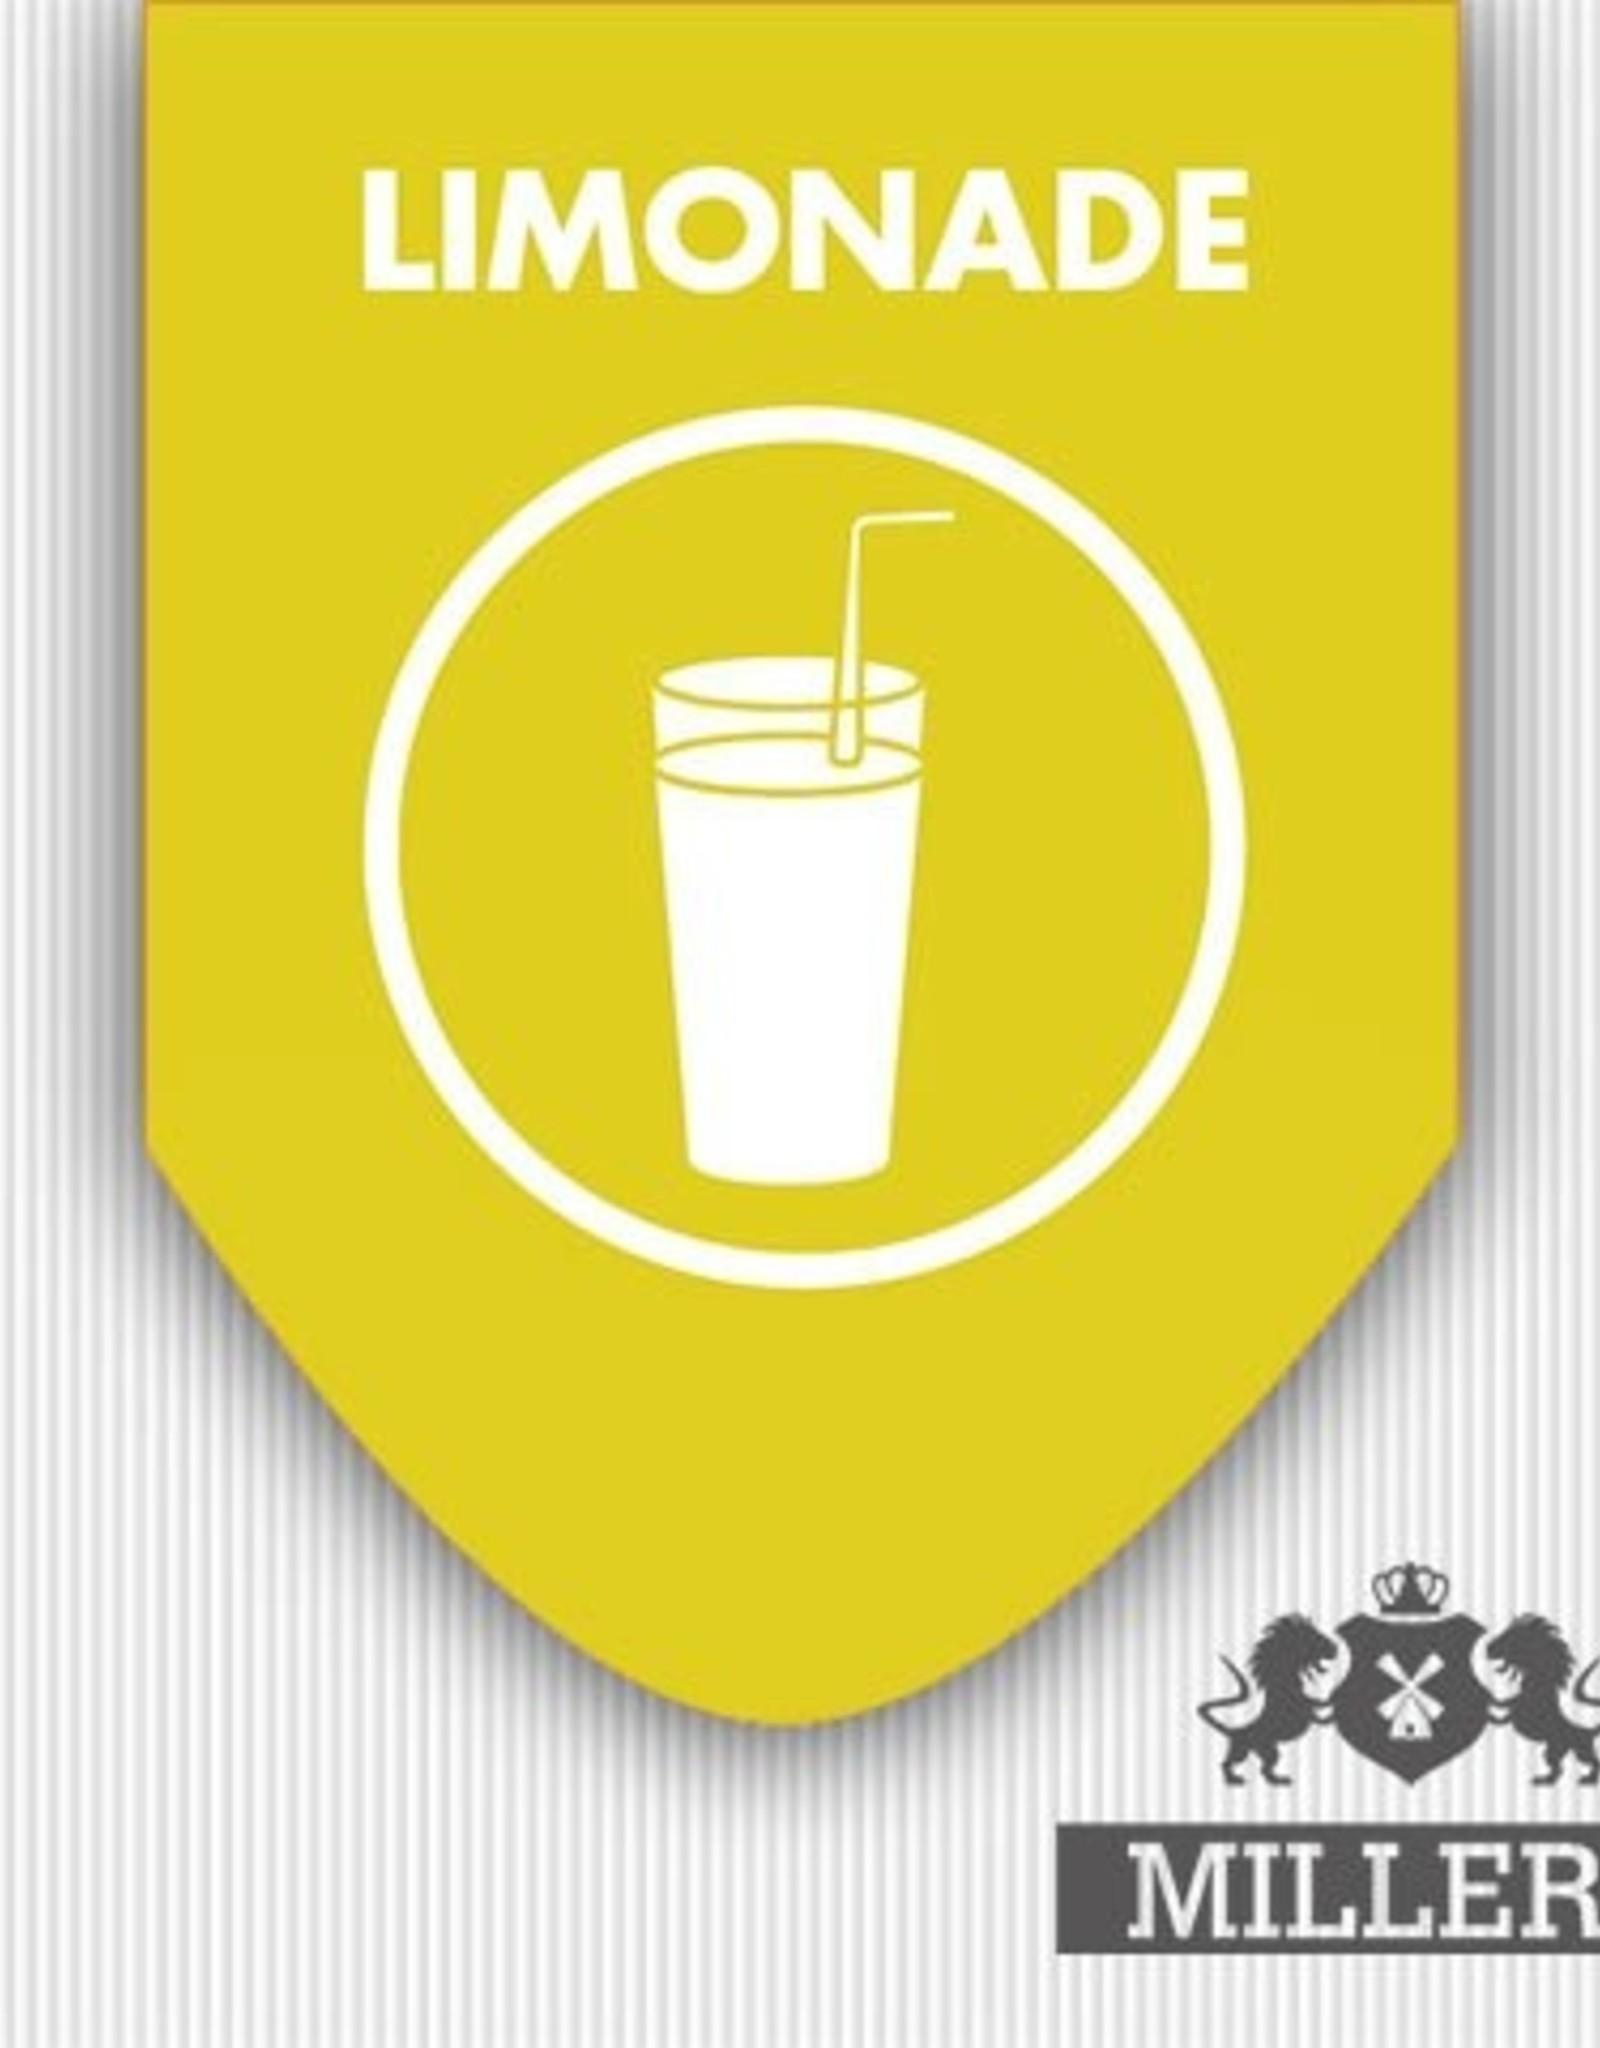 Millers Juice Miller Juice E-liquid Silverline 10 ml Limonade 3 mg